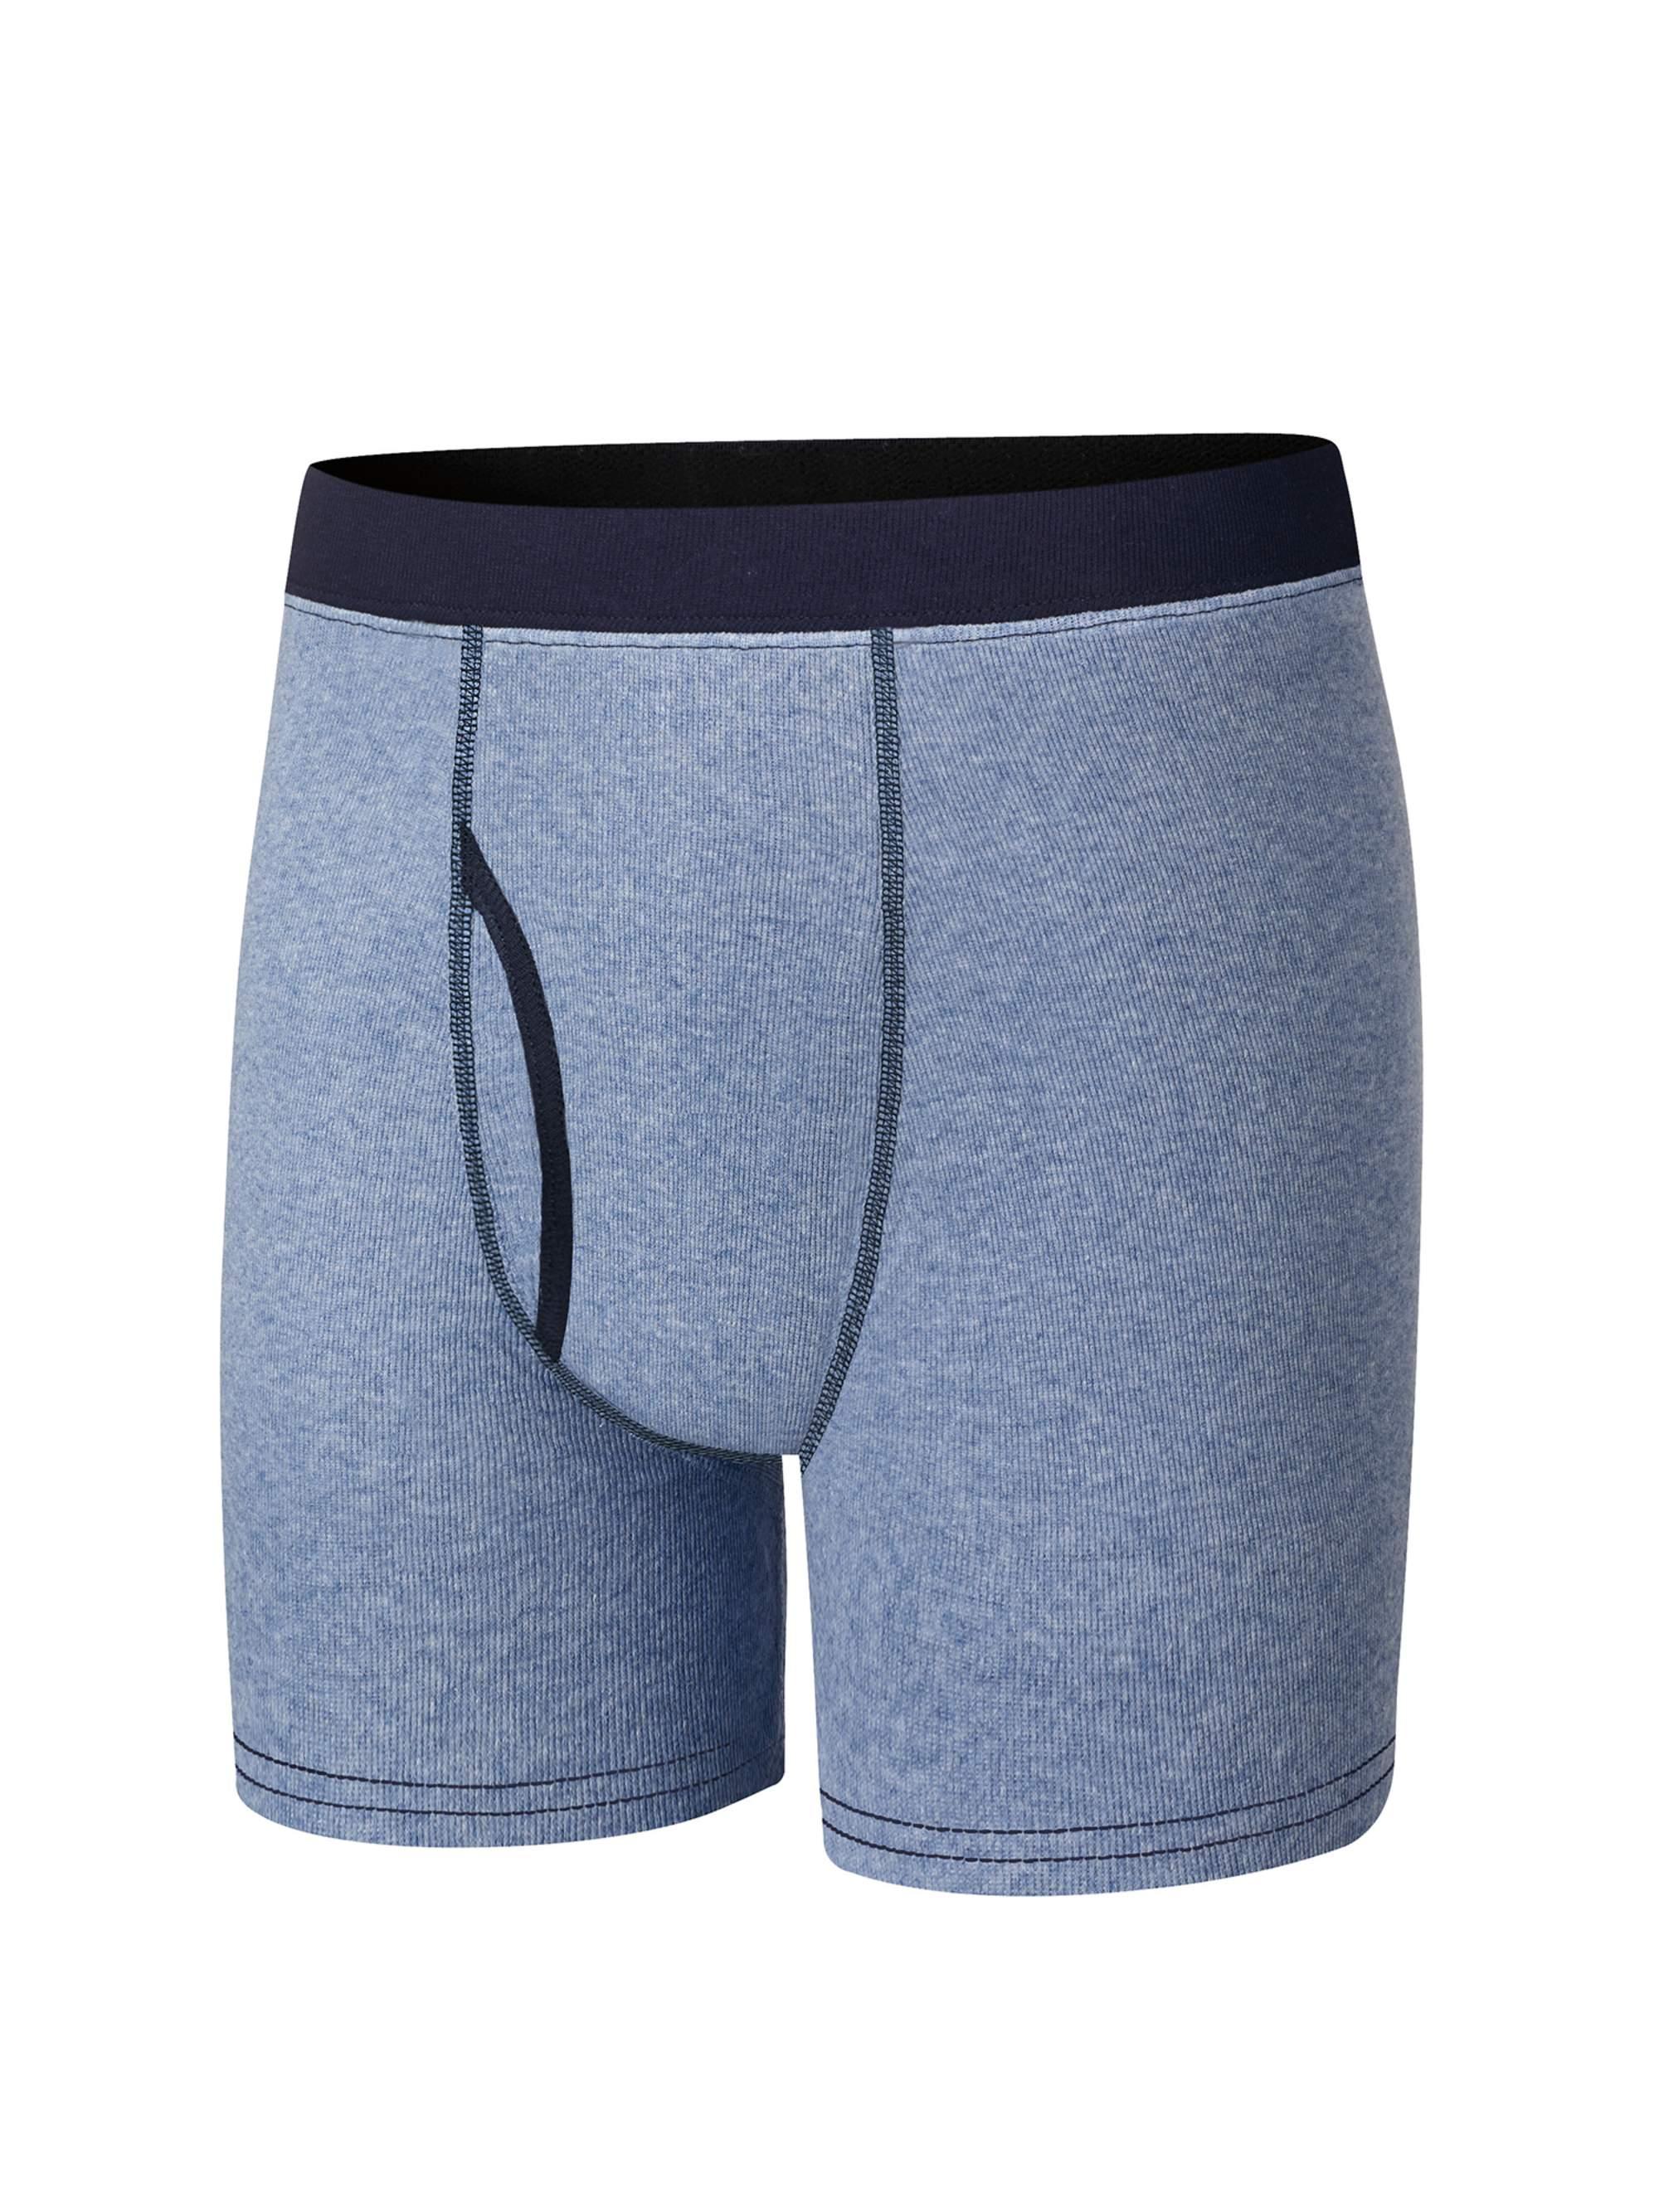 Hanes Boys 100% Cotton Boxer Briefs, 3 Pack